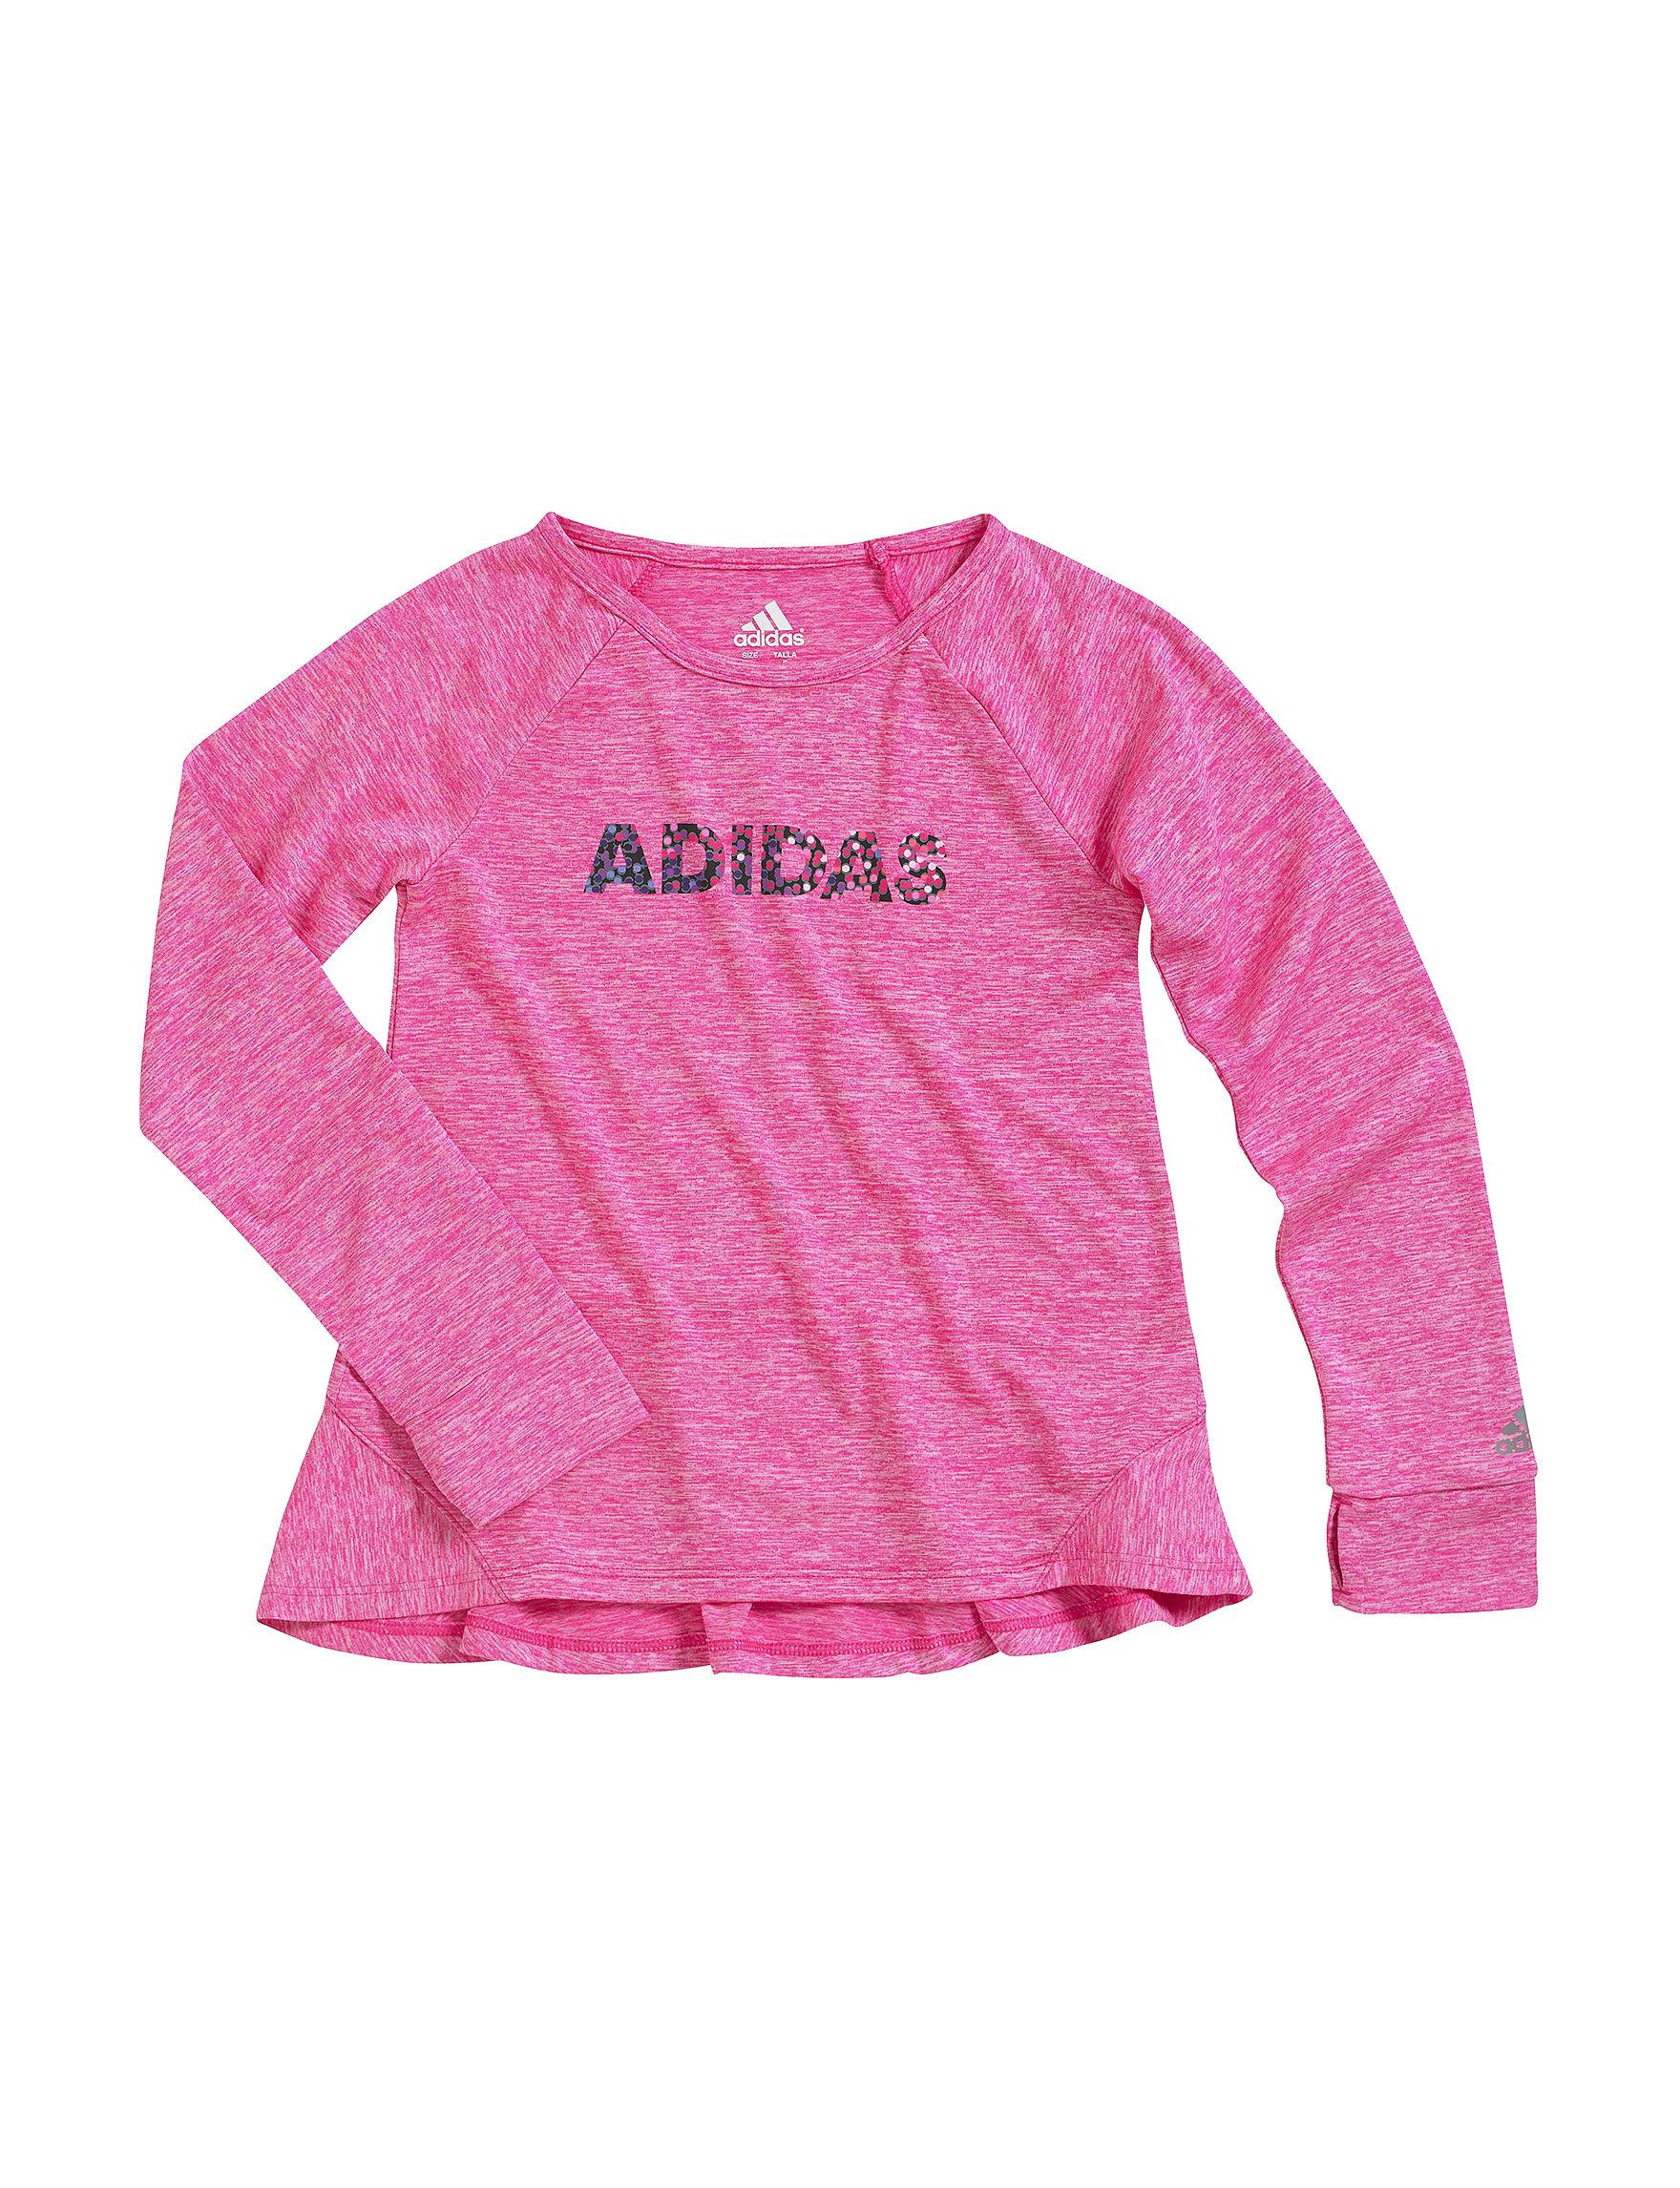 Adidas Pink